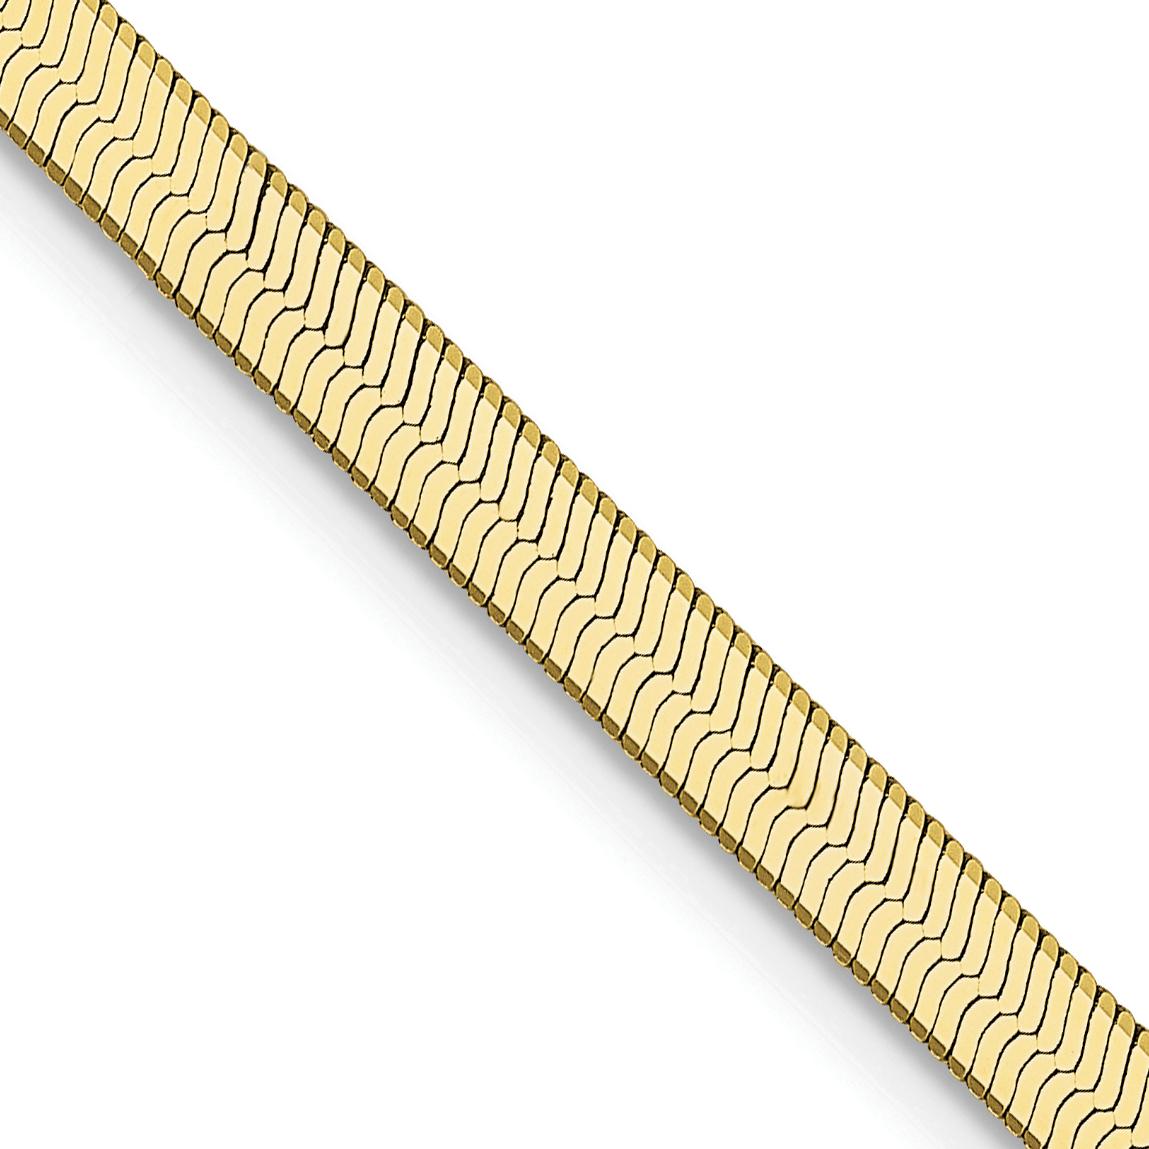 10k 3.0mm Silky Herringbone Chain. Weight: 4.61,  Length: 16